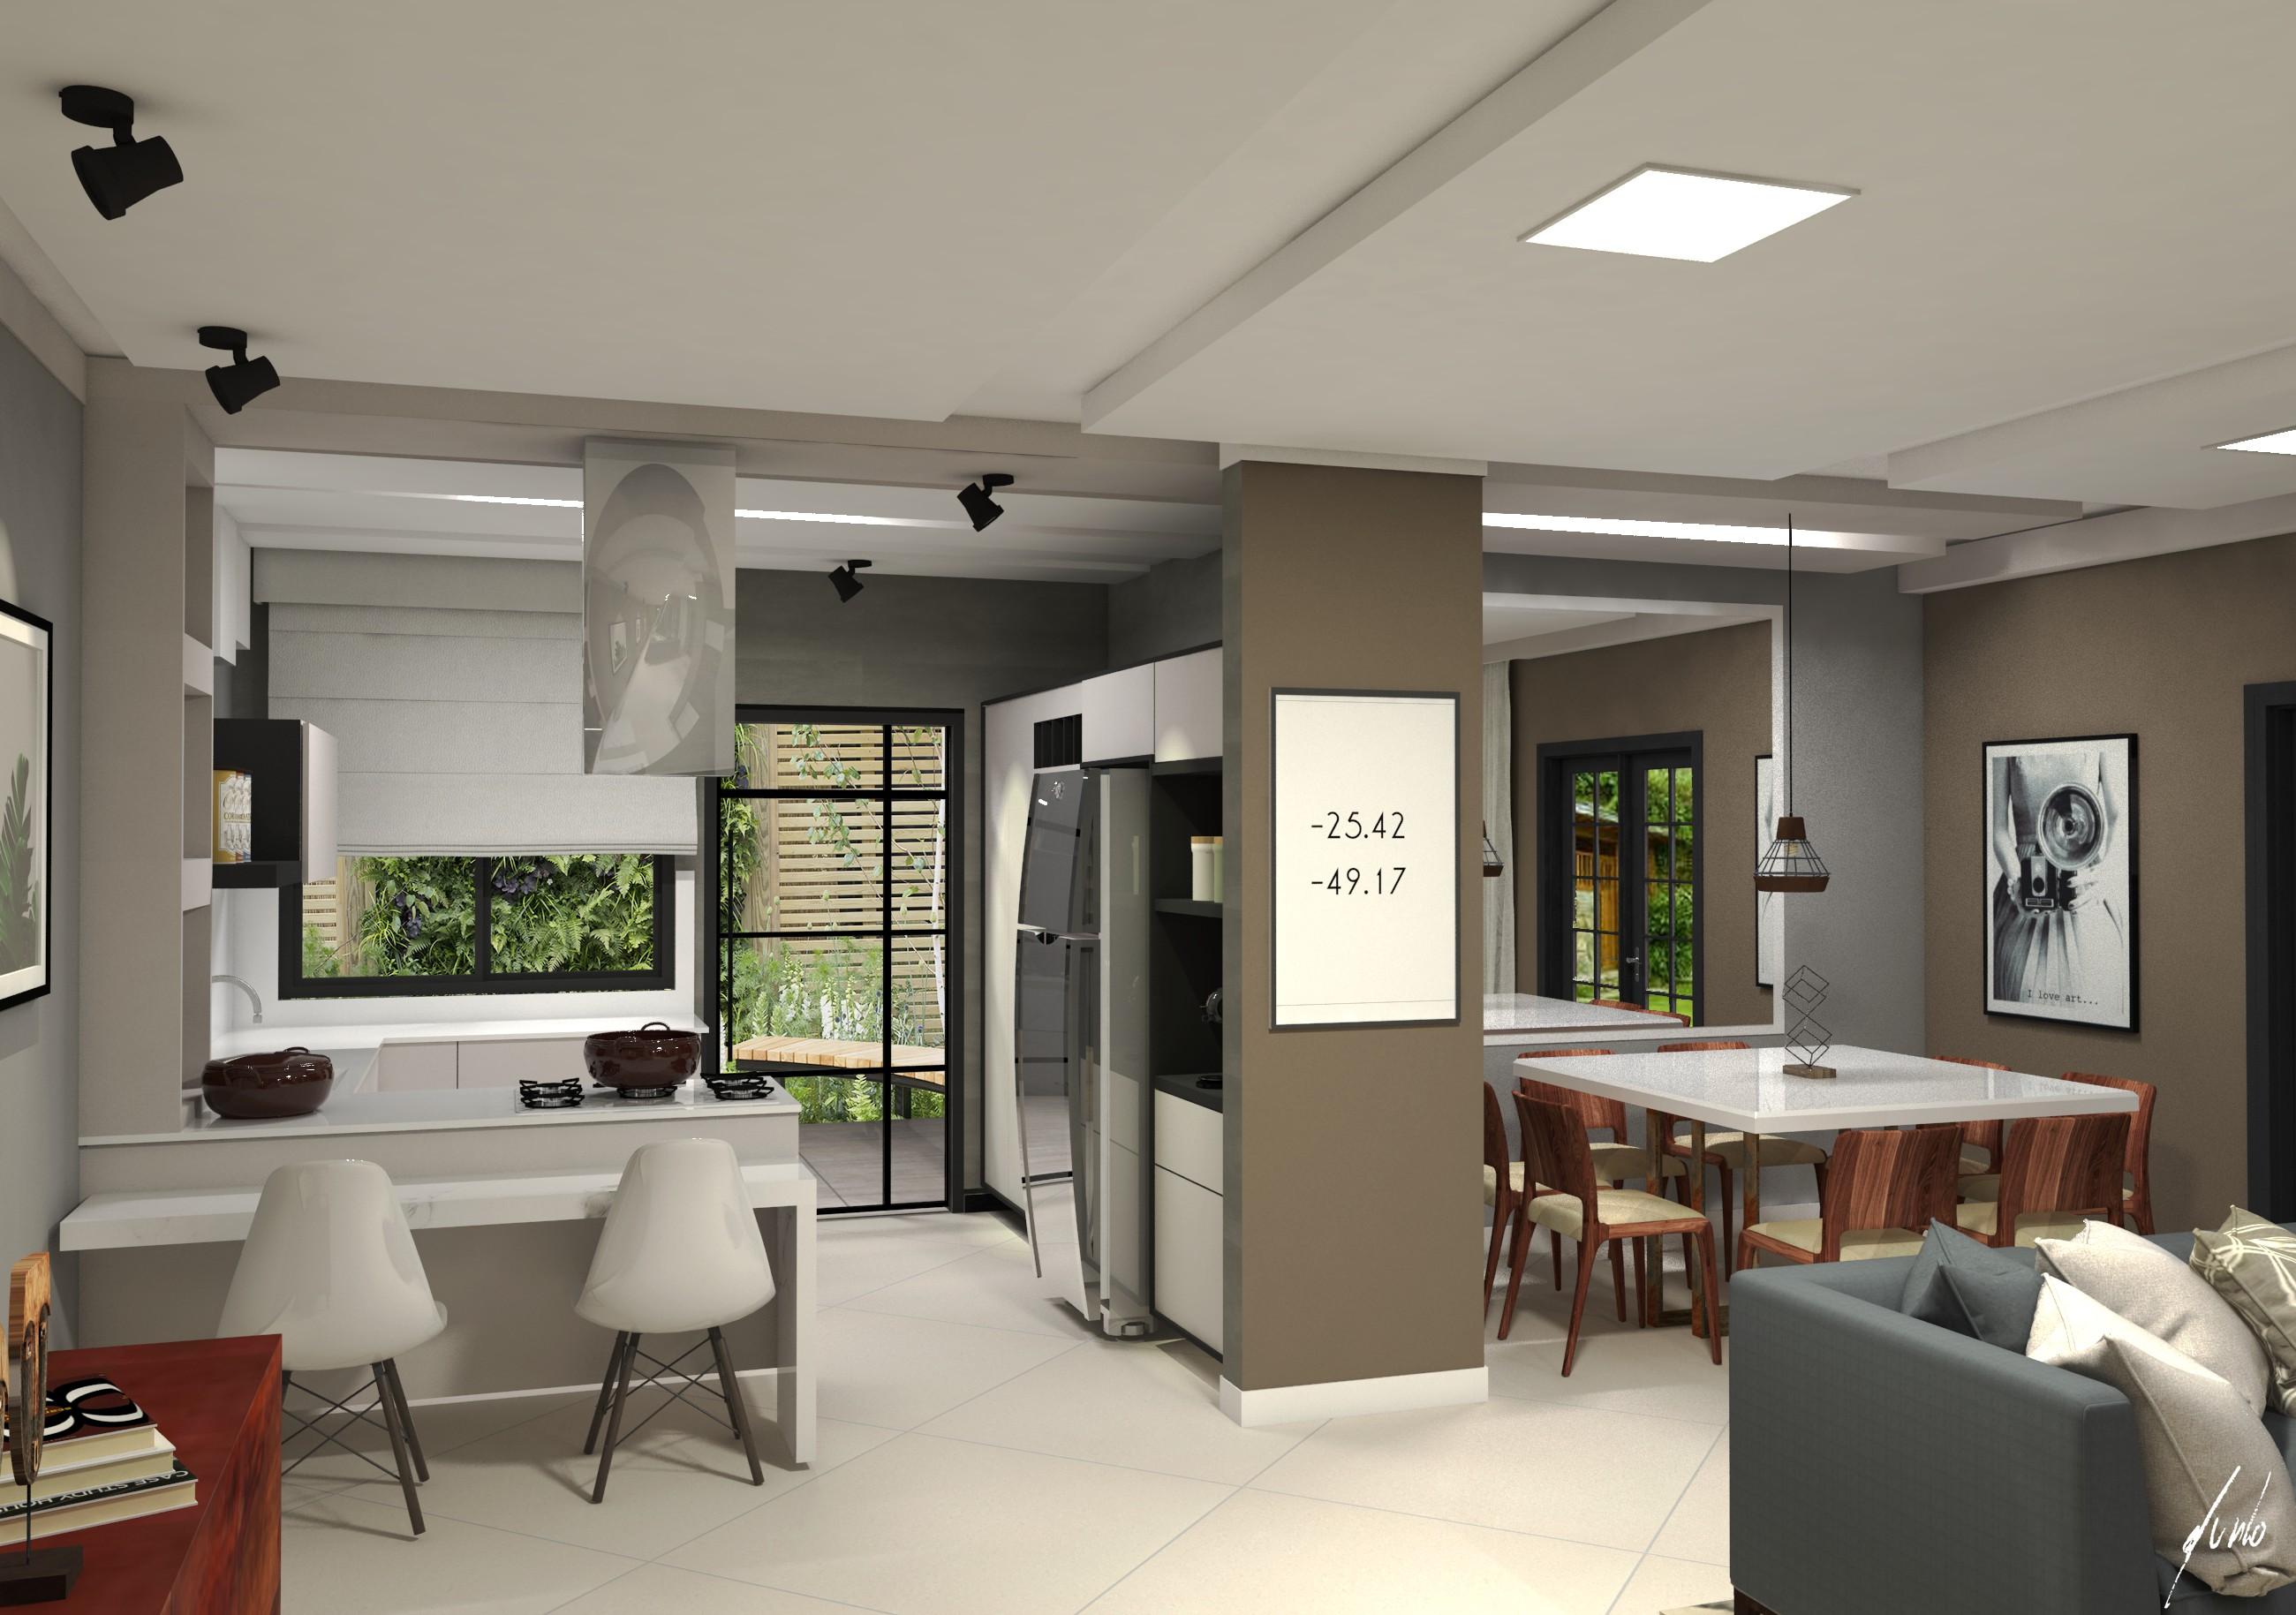 Salas integradas est dio murilo zadulski interiores - Interiores de casas pequenas ...